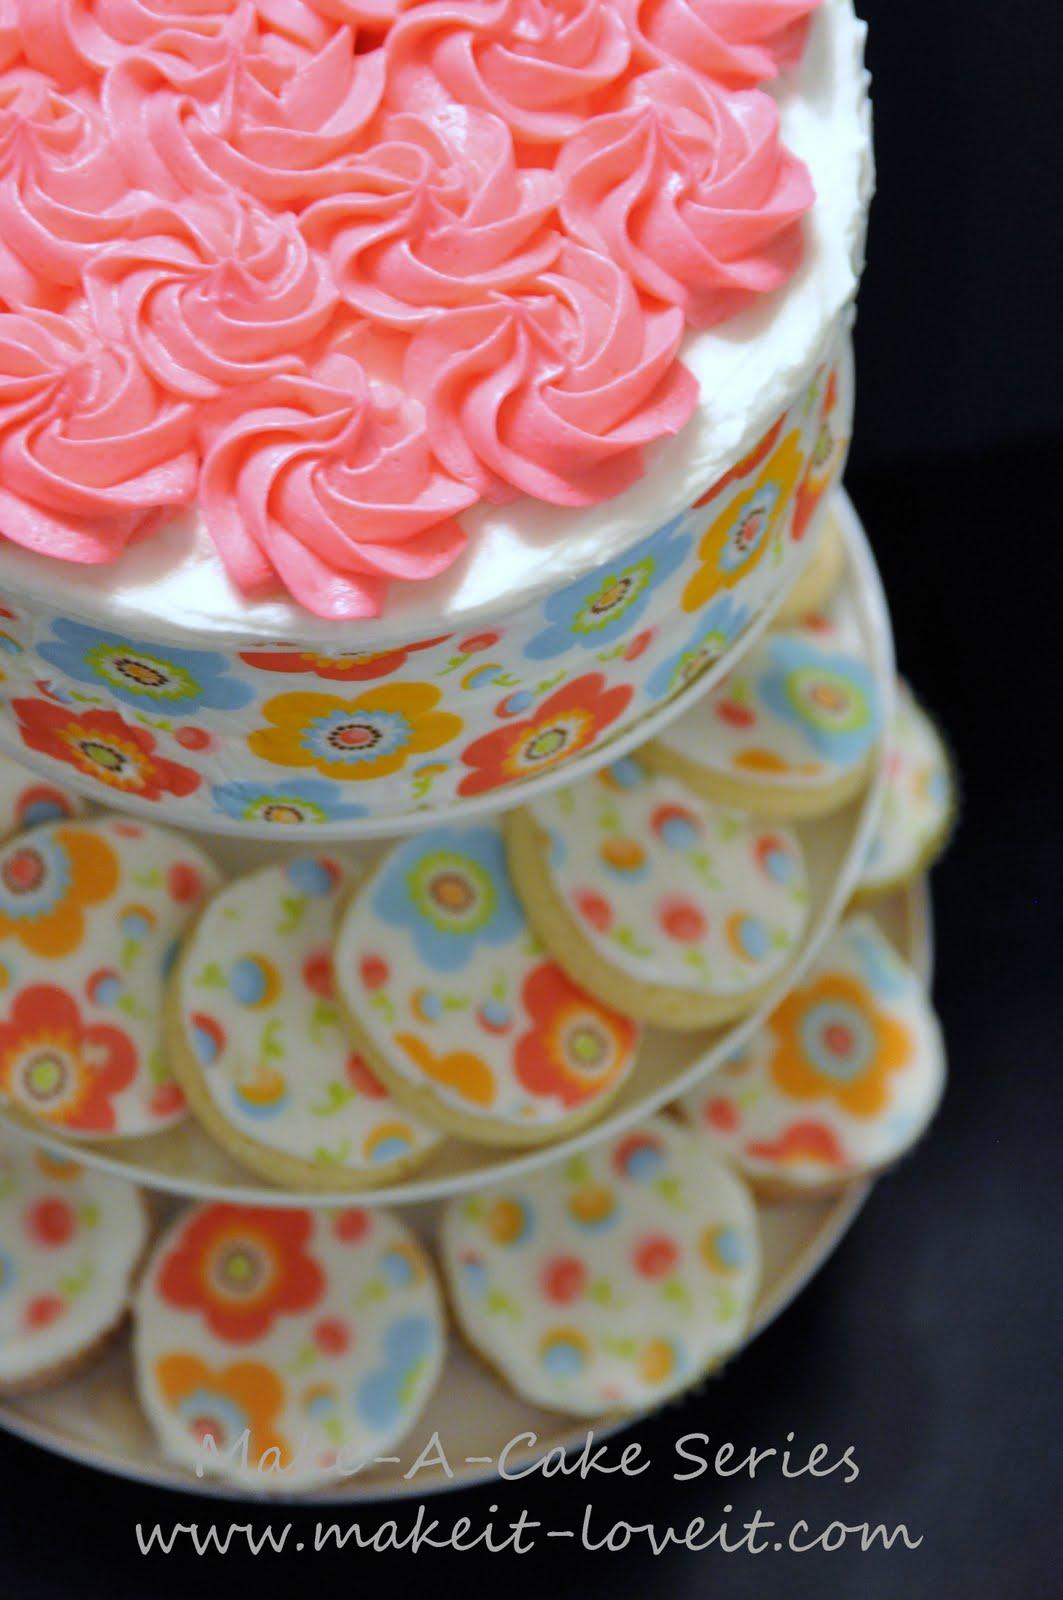 Make A Cake Series Cake Tattoo Make It And Love It